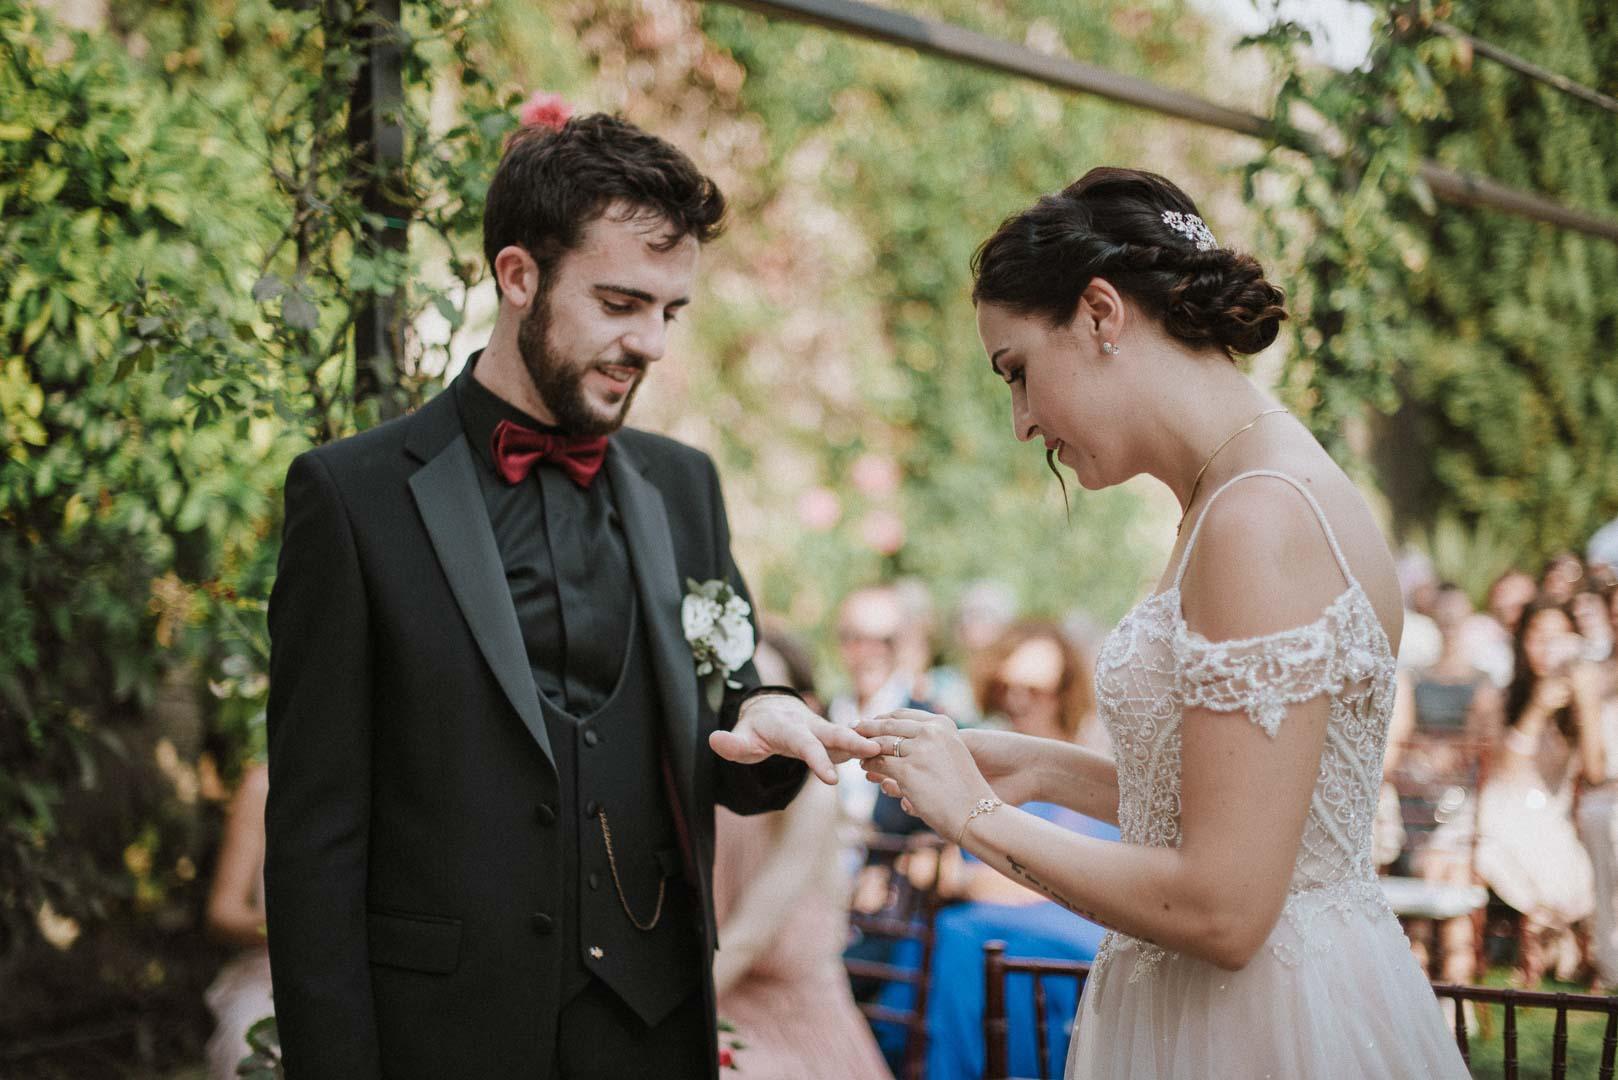 wedding-photographer-destination-fineart-bespoke-reportage-tuscany-villascorzi-vivianeizzo-spazio46-74